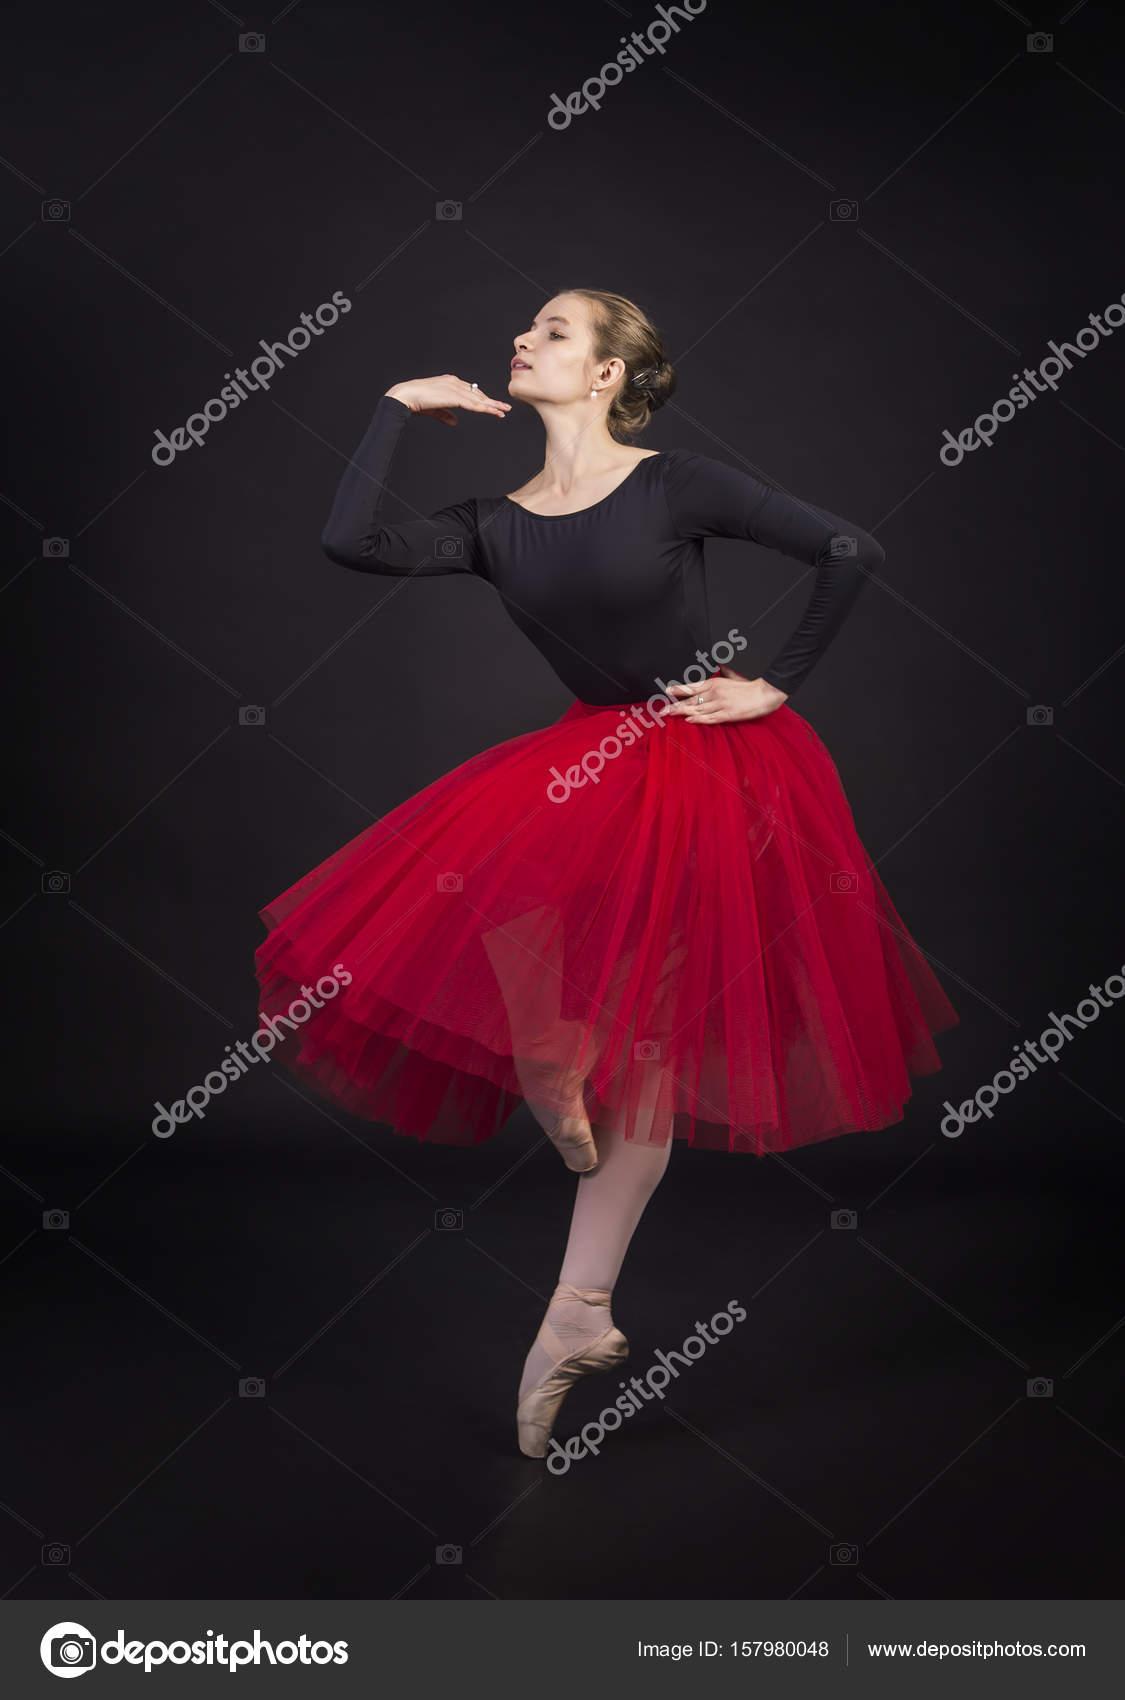 Телочка танцует в юбке